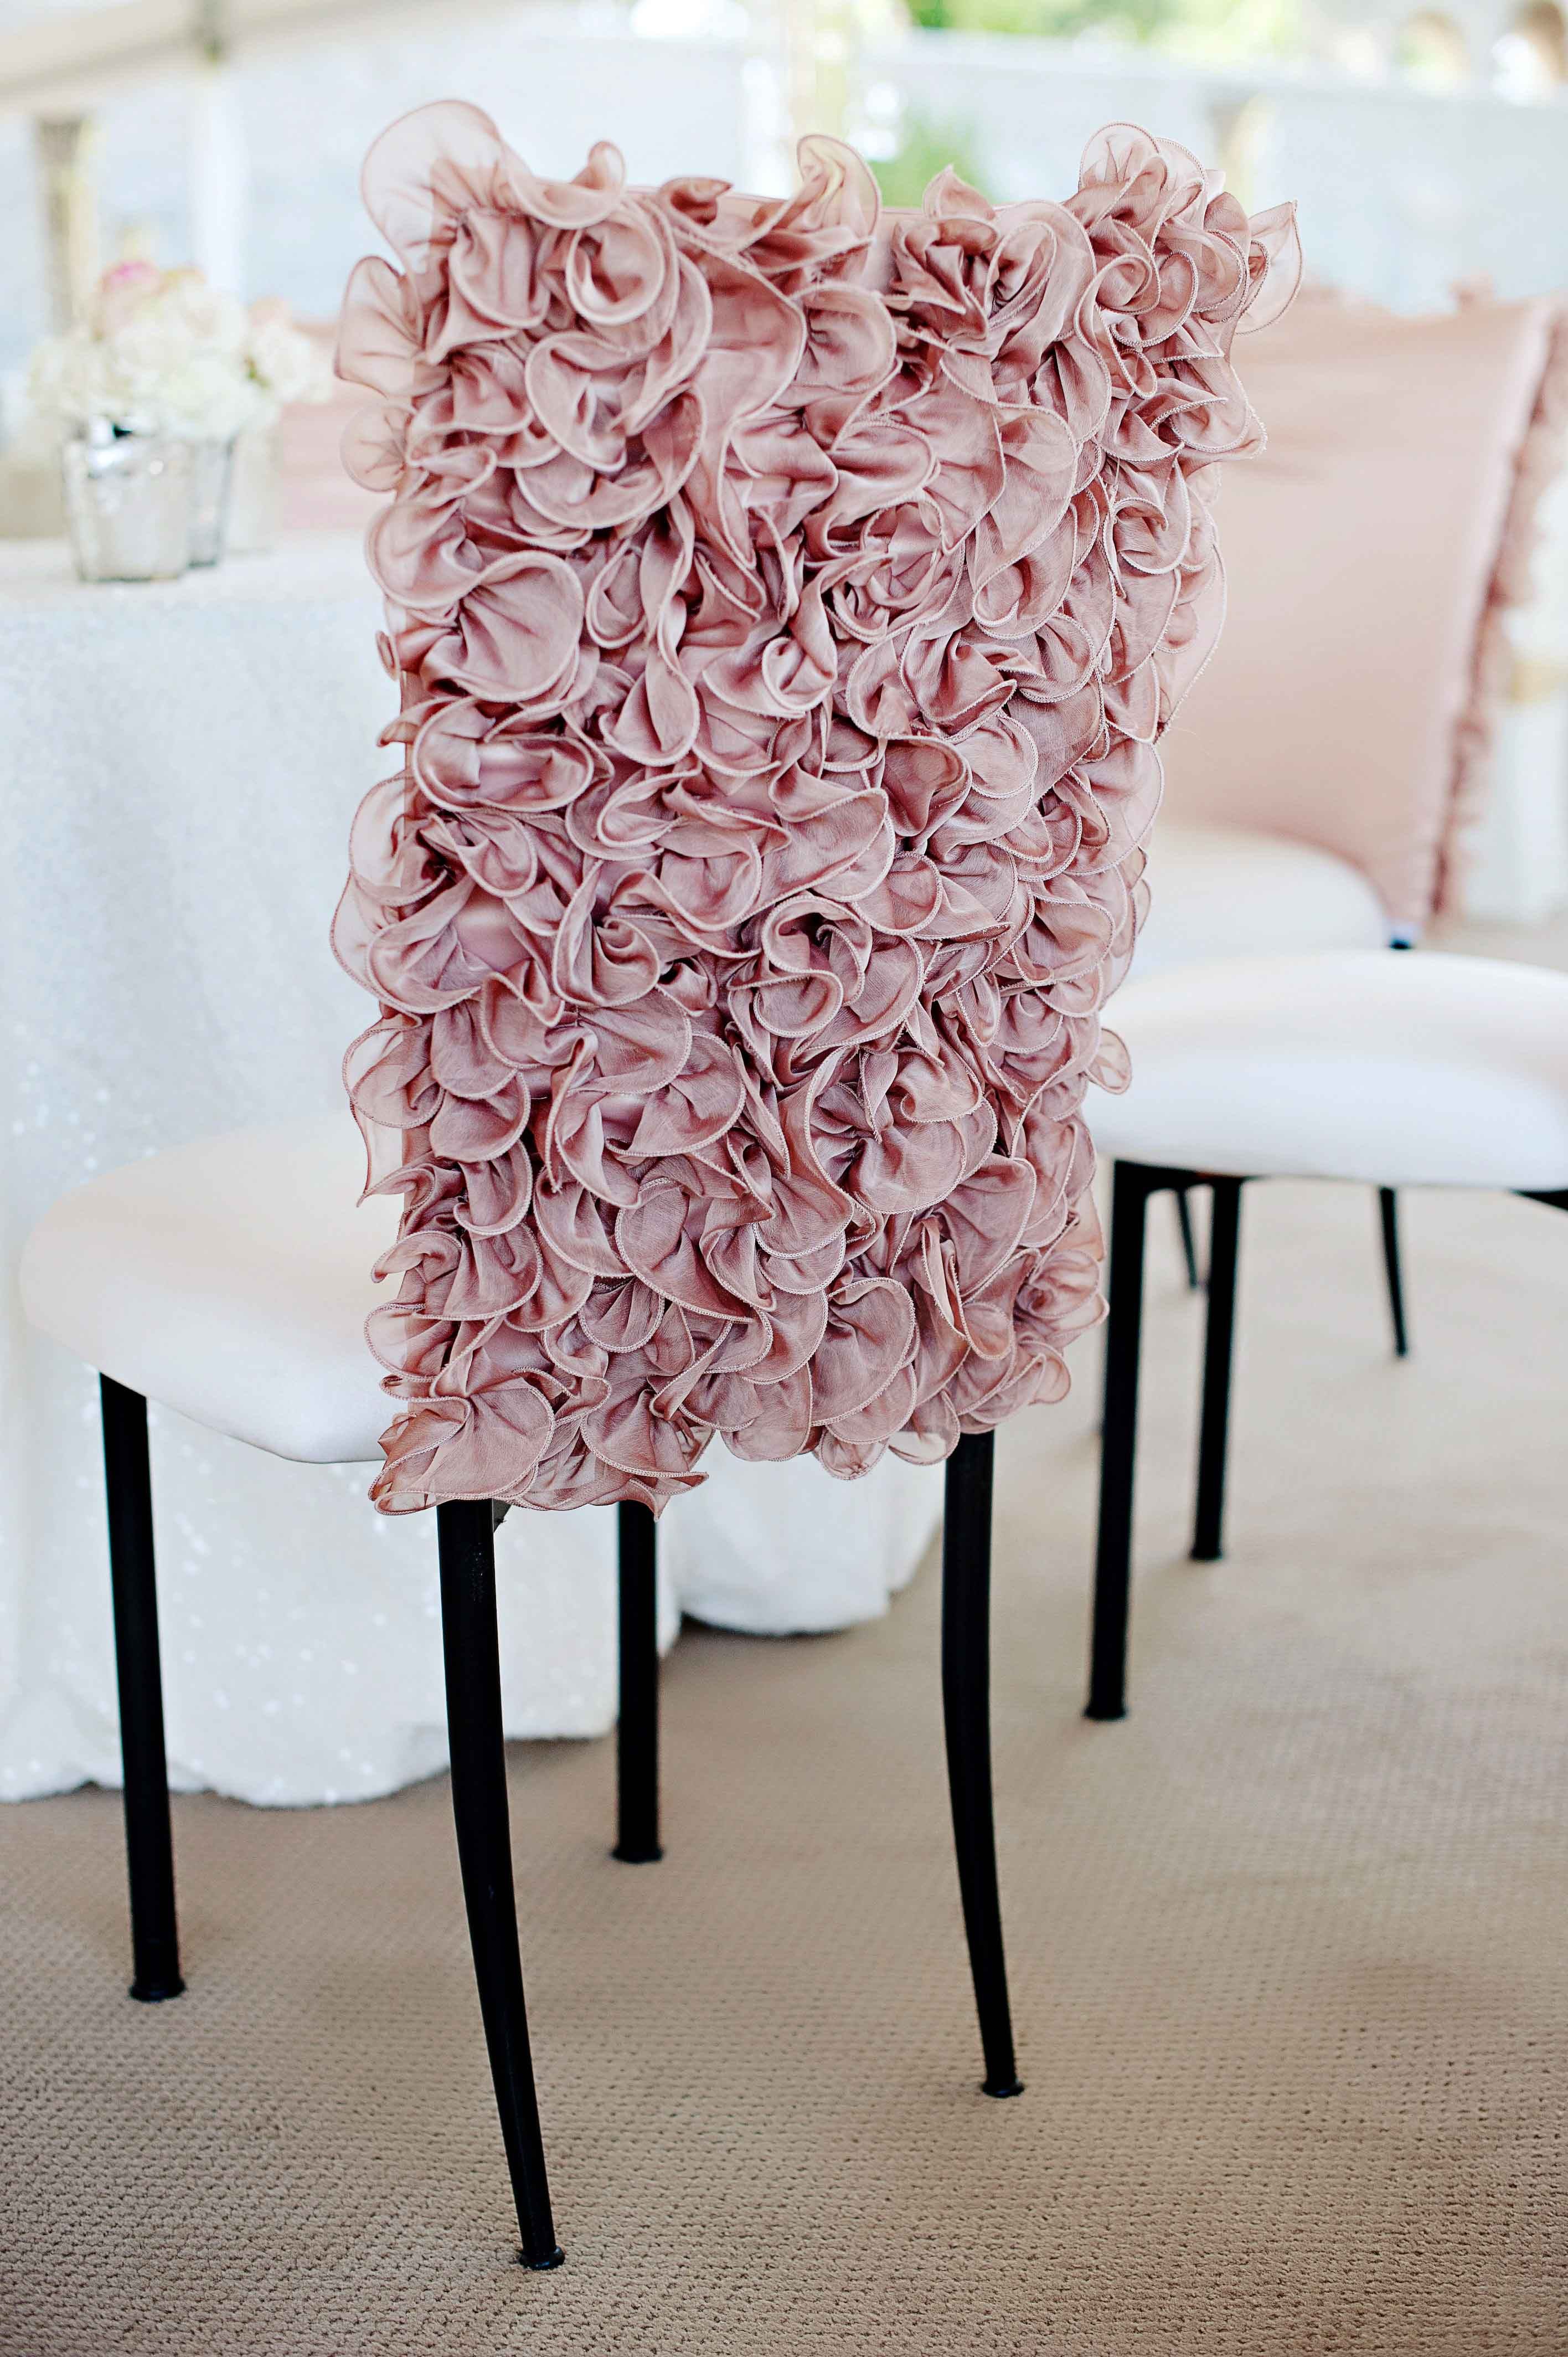 decorative chair covers wedding folding beds ideas 8 ways to add ruffles décor inside